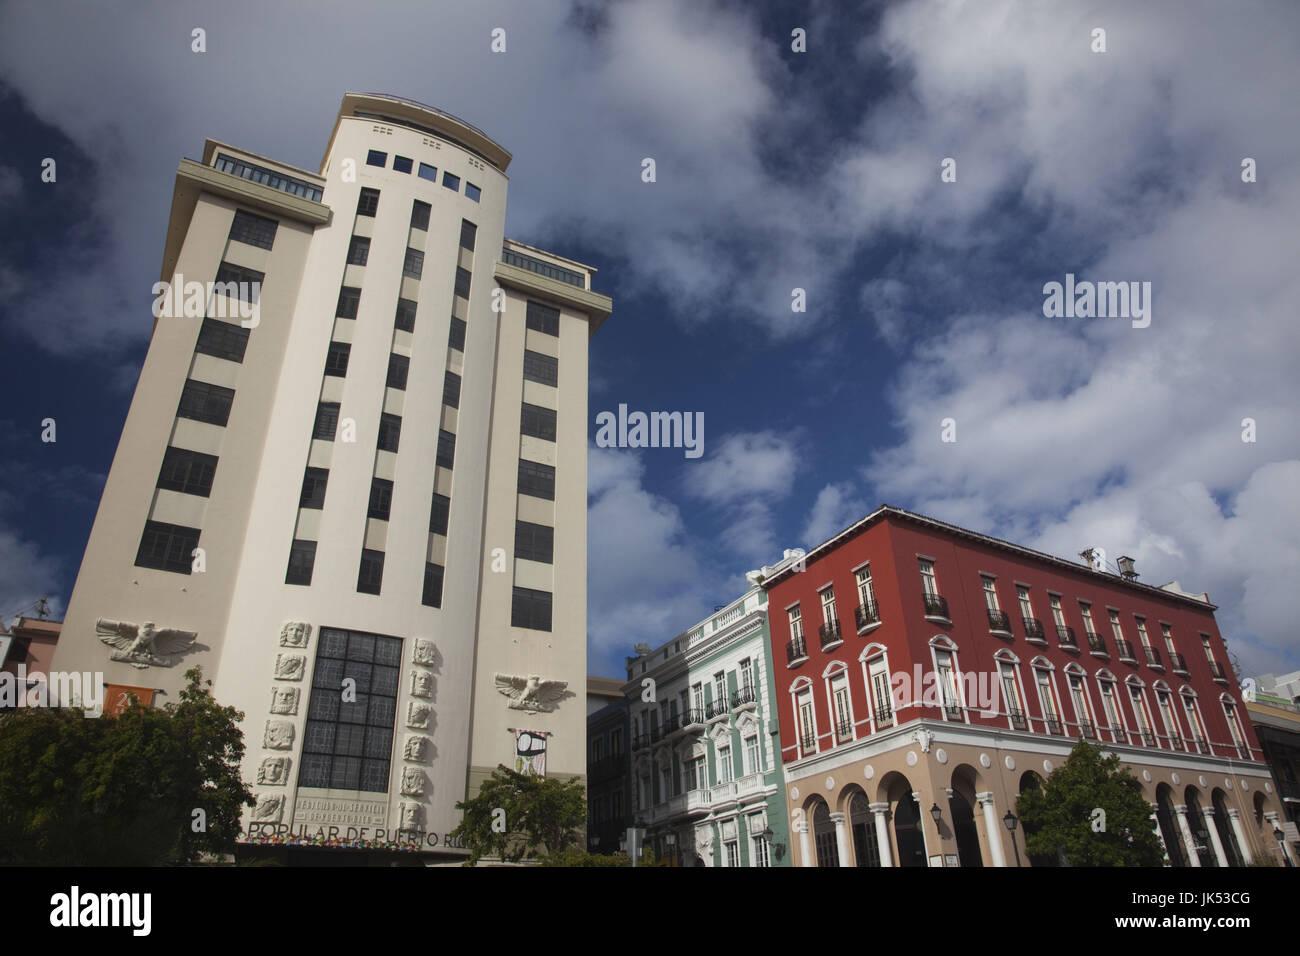 Puerto Rico, San Juan, art-deco Banco Popular building - Stock Image